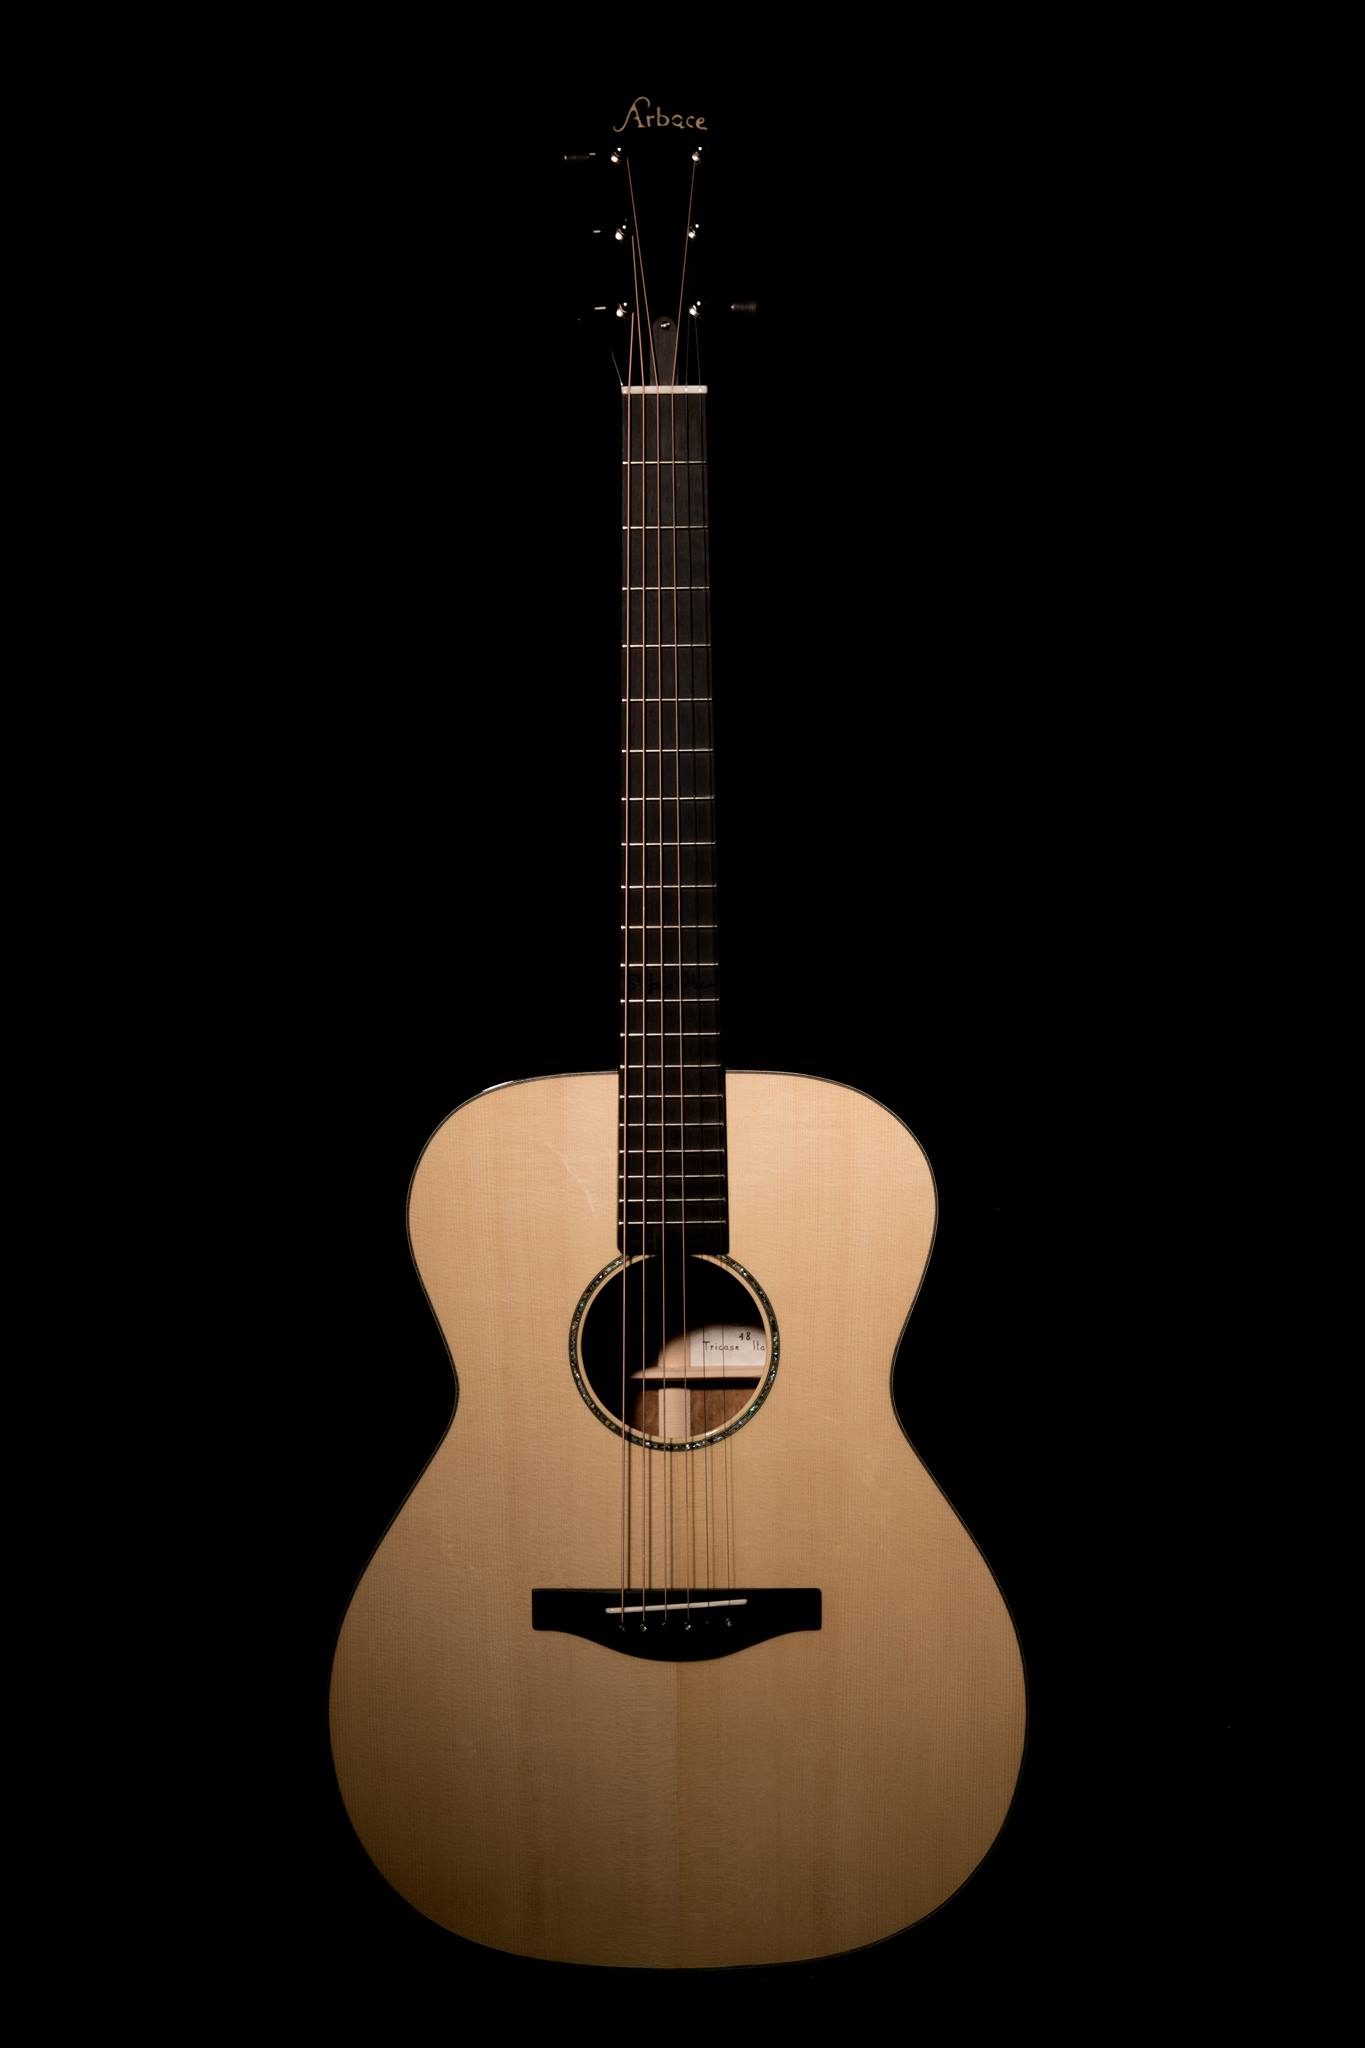 MickiPiperno_Guitar_Liuteria_Arbace